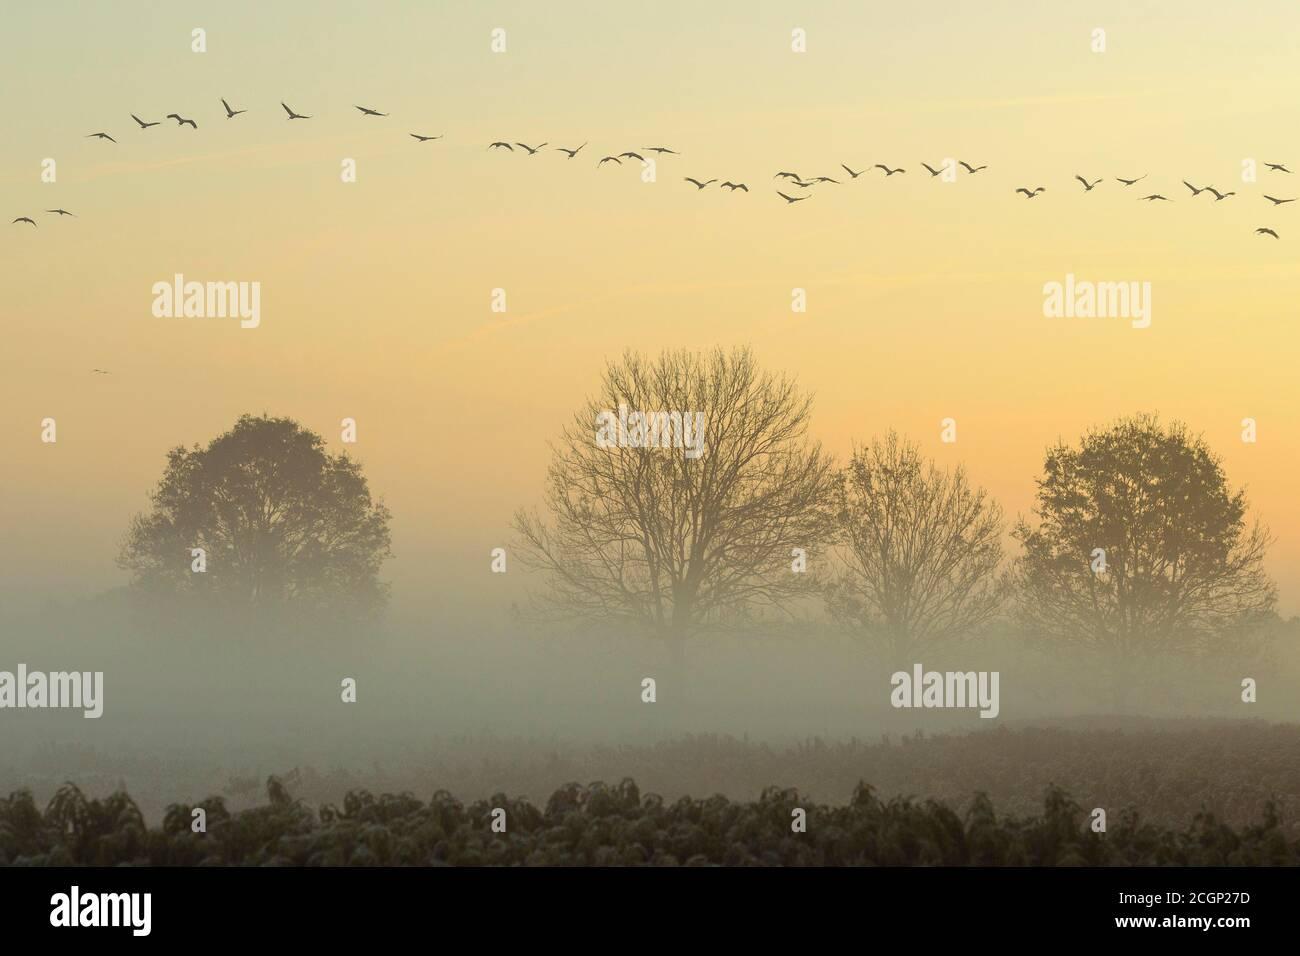 Migrating cranes (grus grus) in autumn over trees in misty landscape, Goldenstedter Moor, bird migration, Oldenburger Muensterland, Lower Saxony Stock Photo